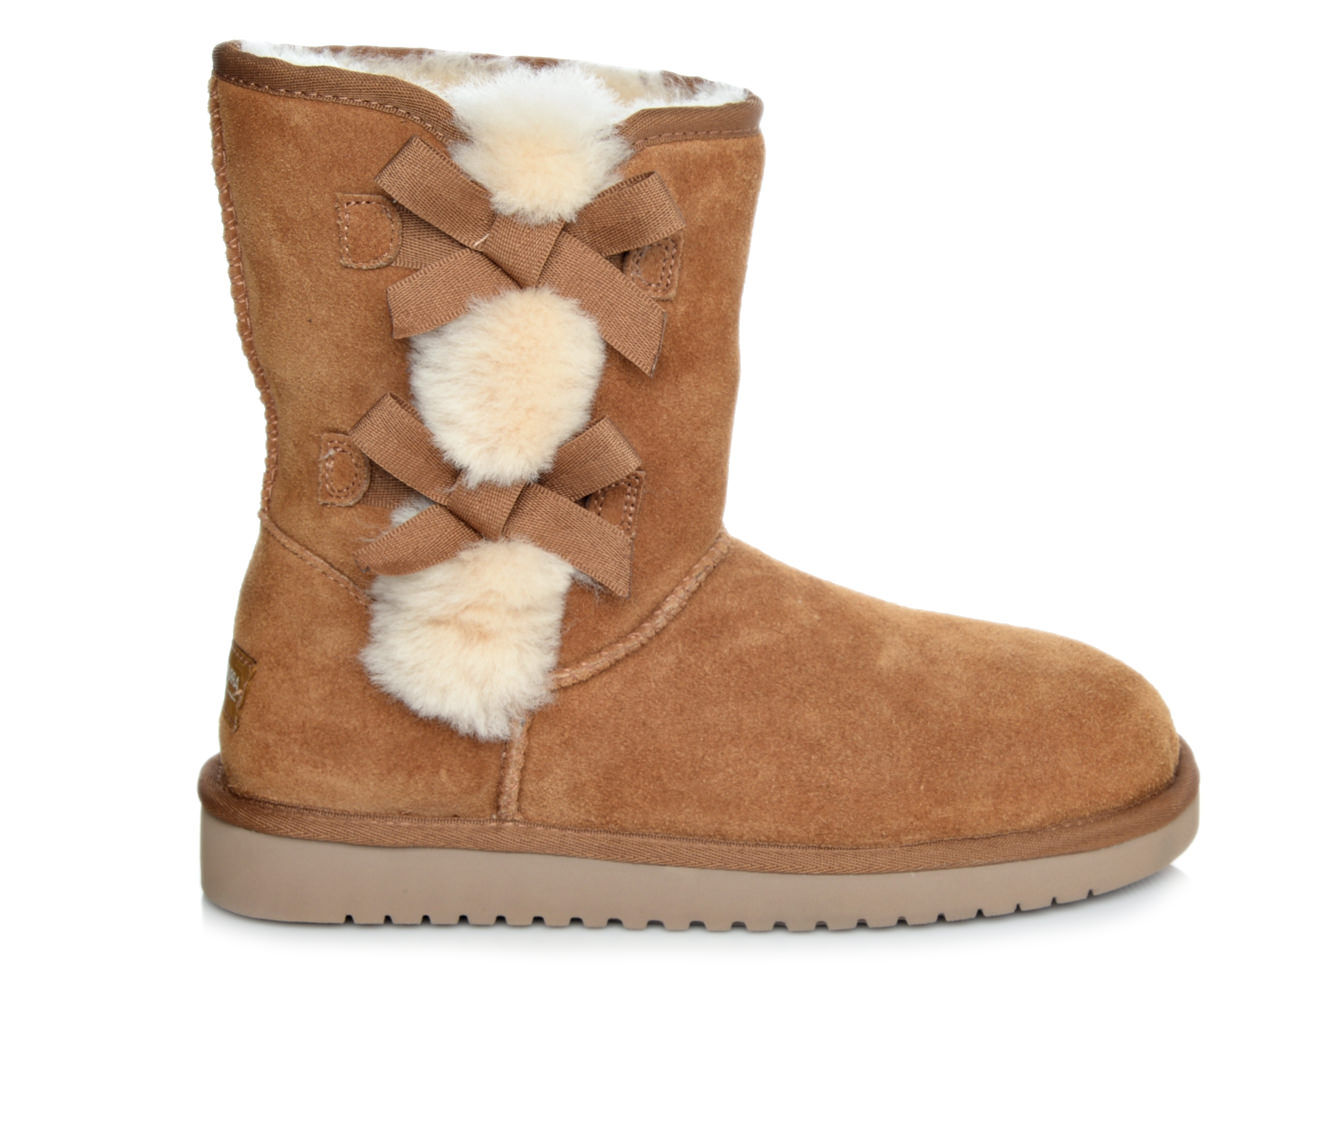 Women's Koolaburra by UGG Victoria Short Faux Fur Boots